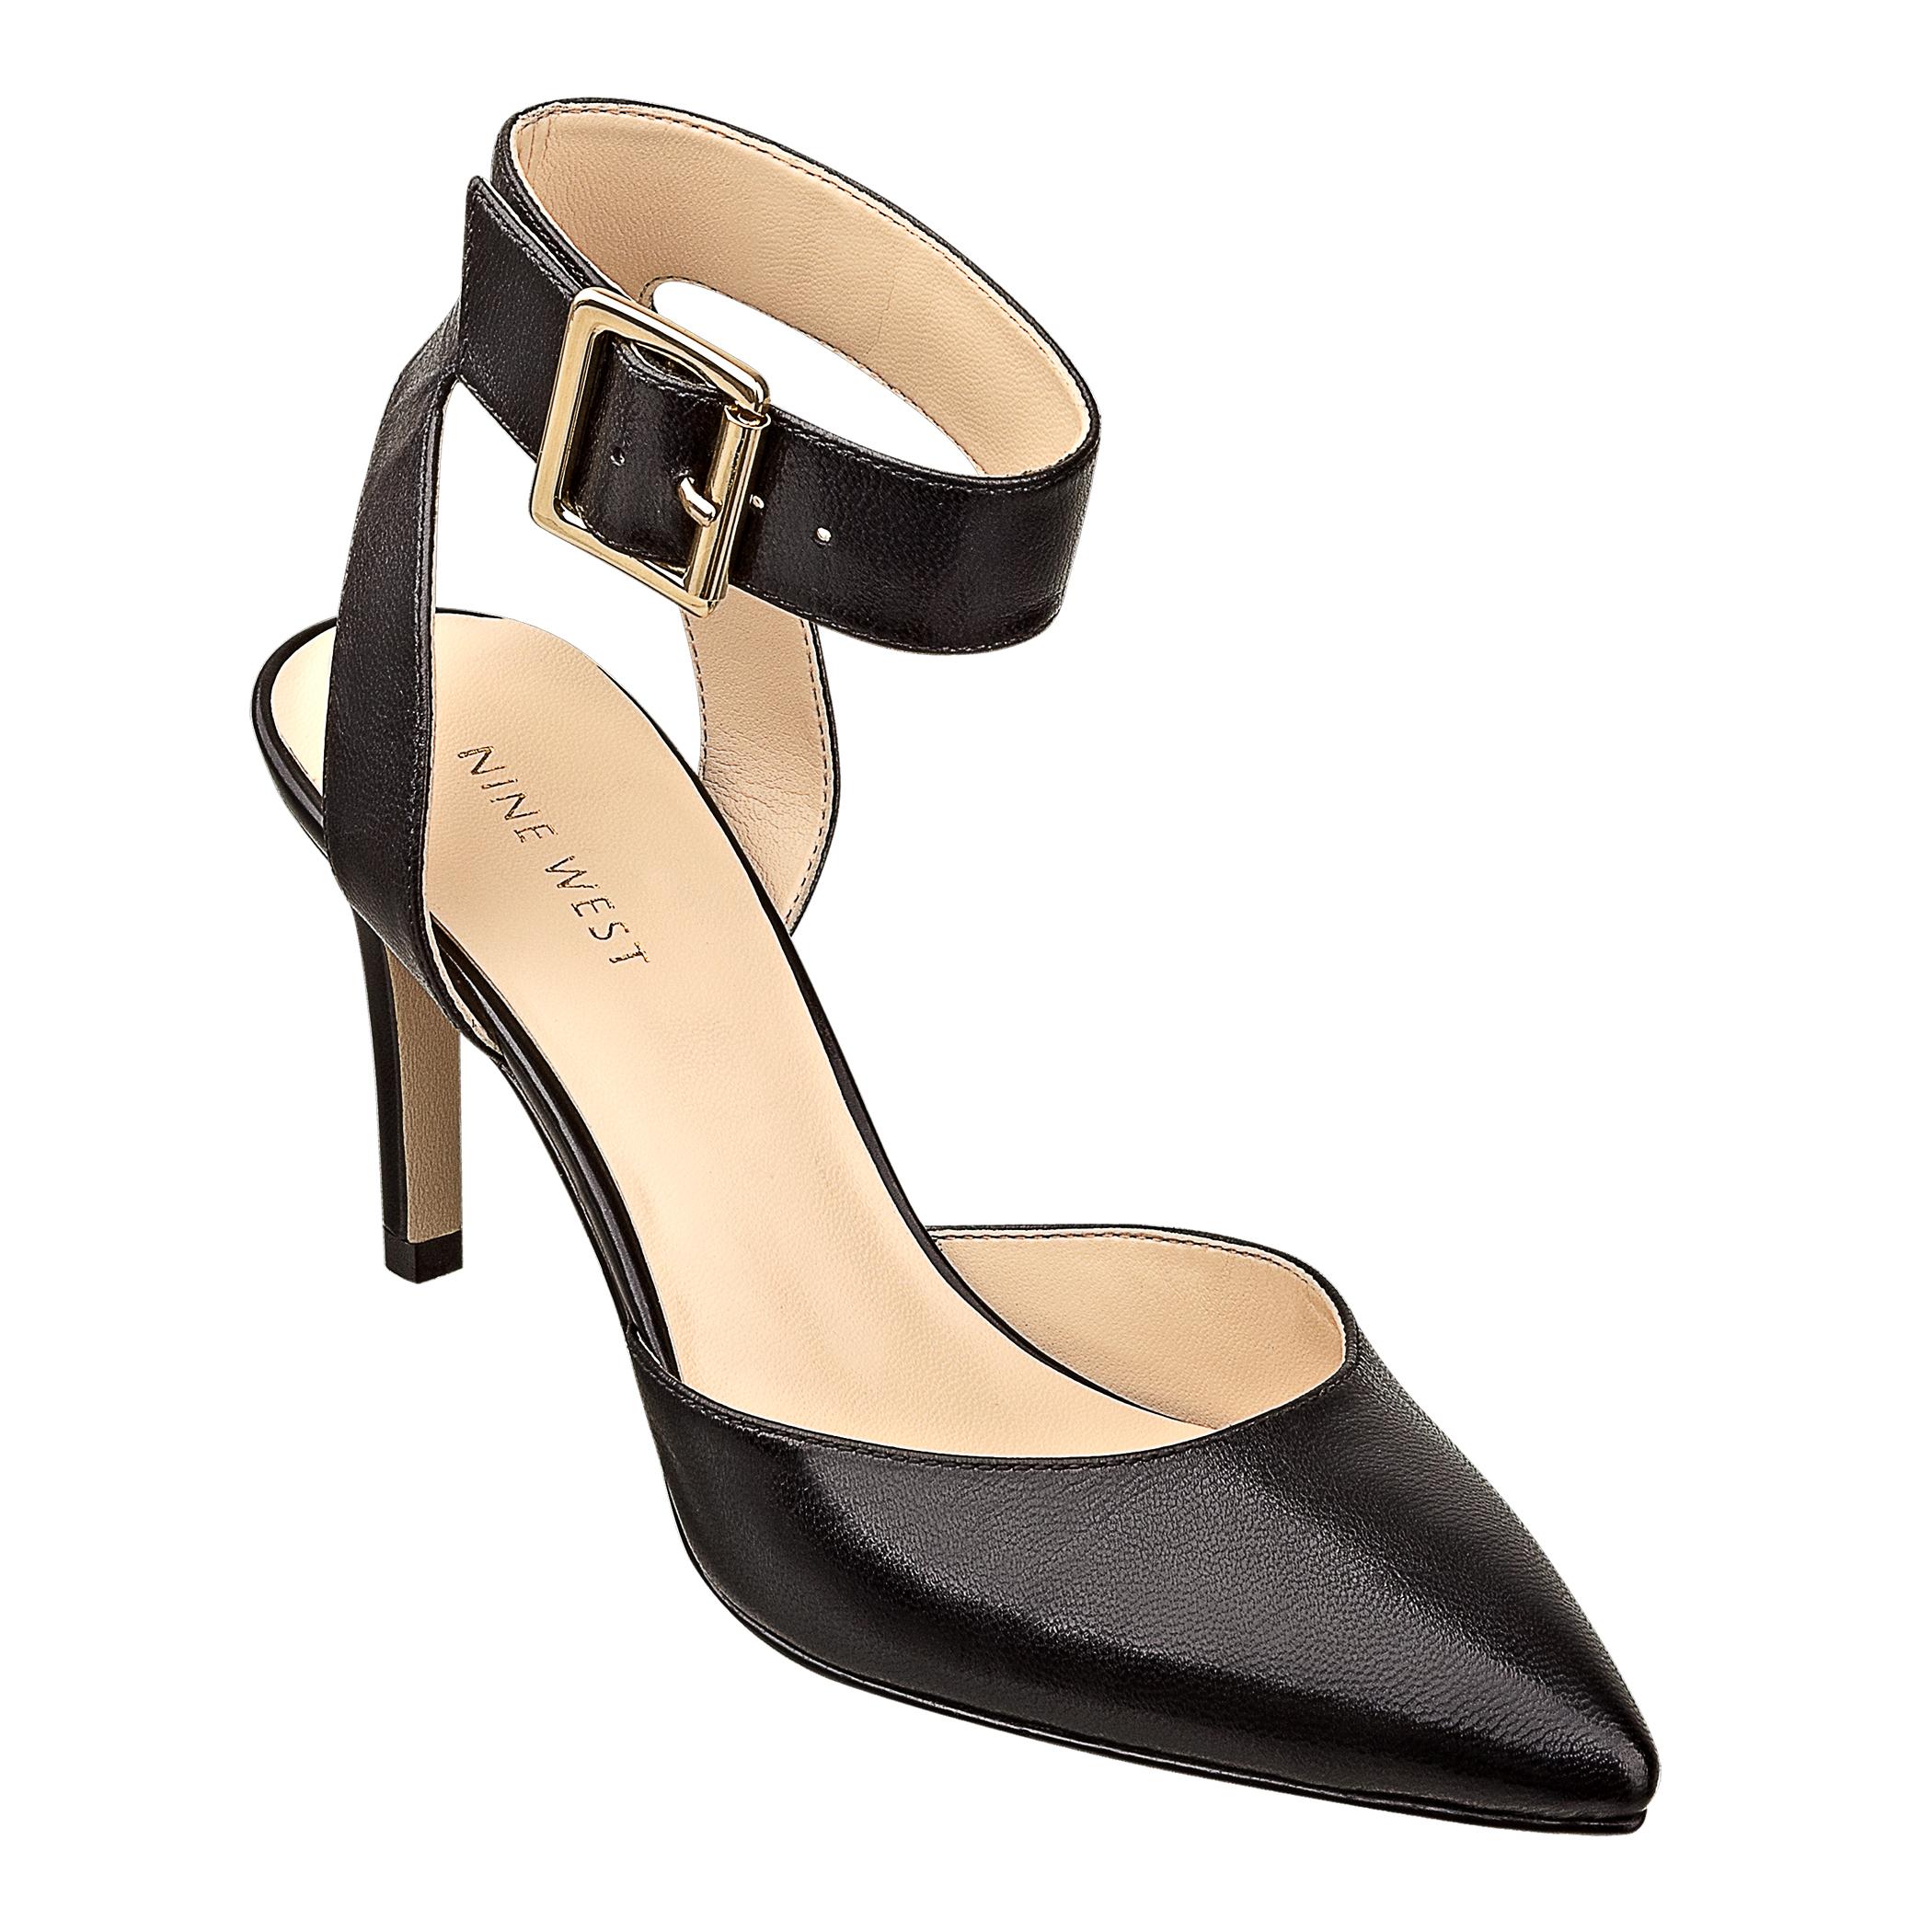 3abea1b338 Nine West Callen Ankle Strap Heels in Black - Lyst